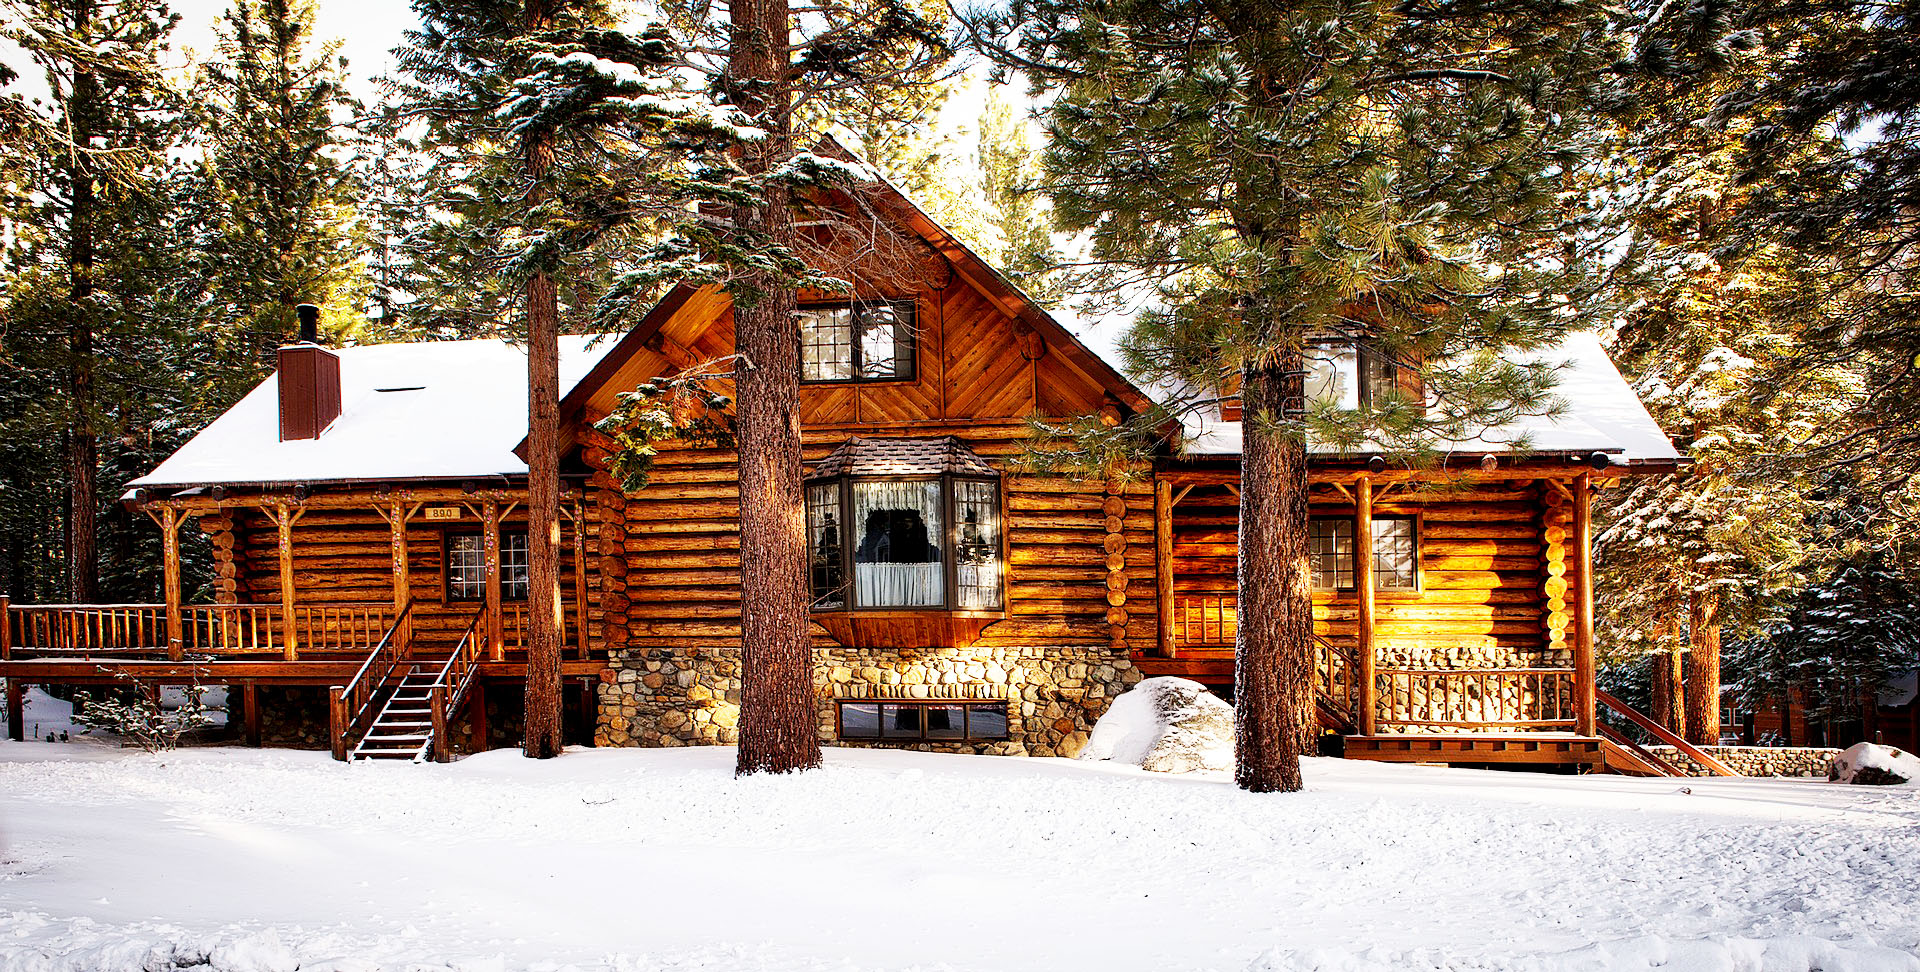 cabin-1594361_1920_adj.jpg